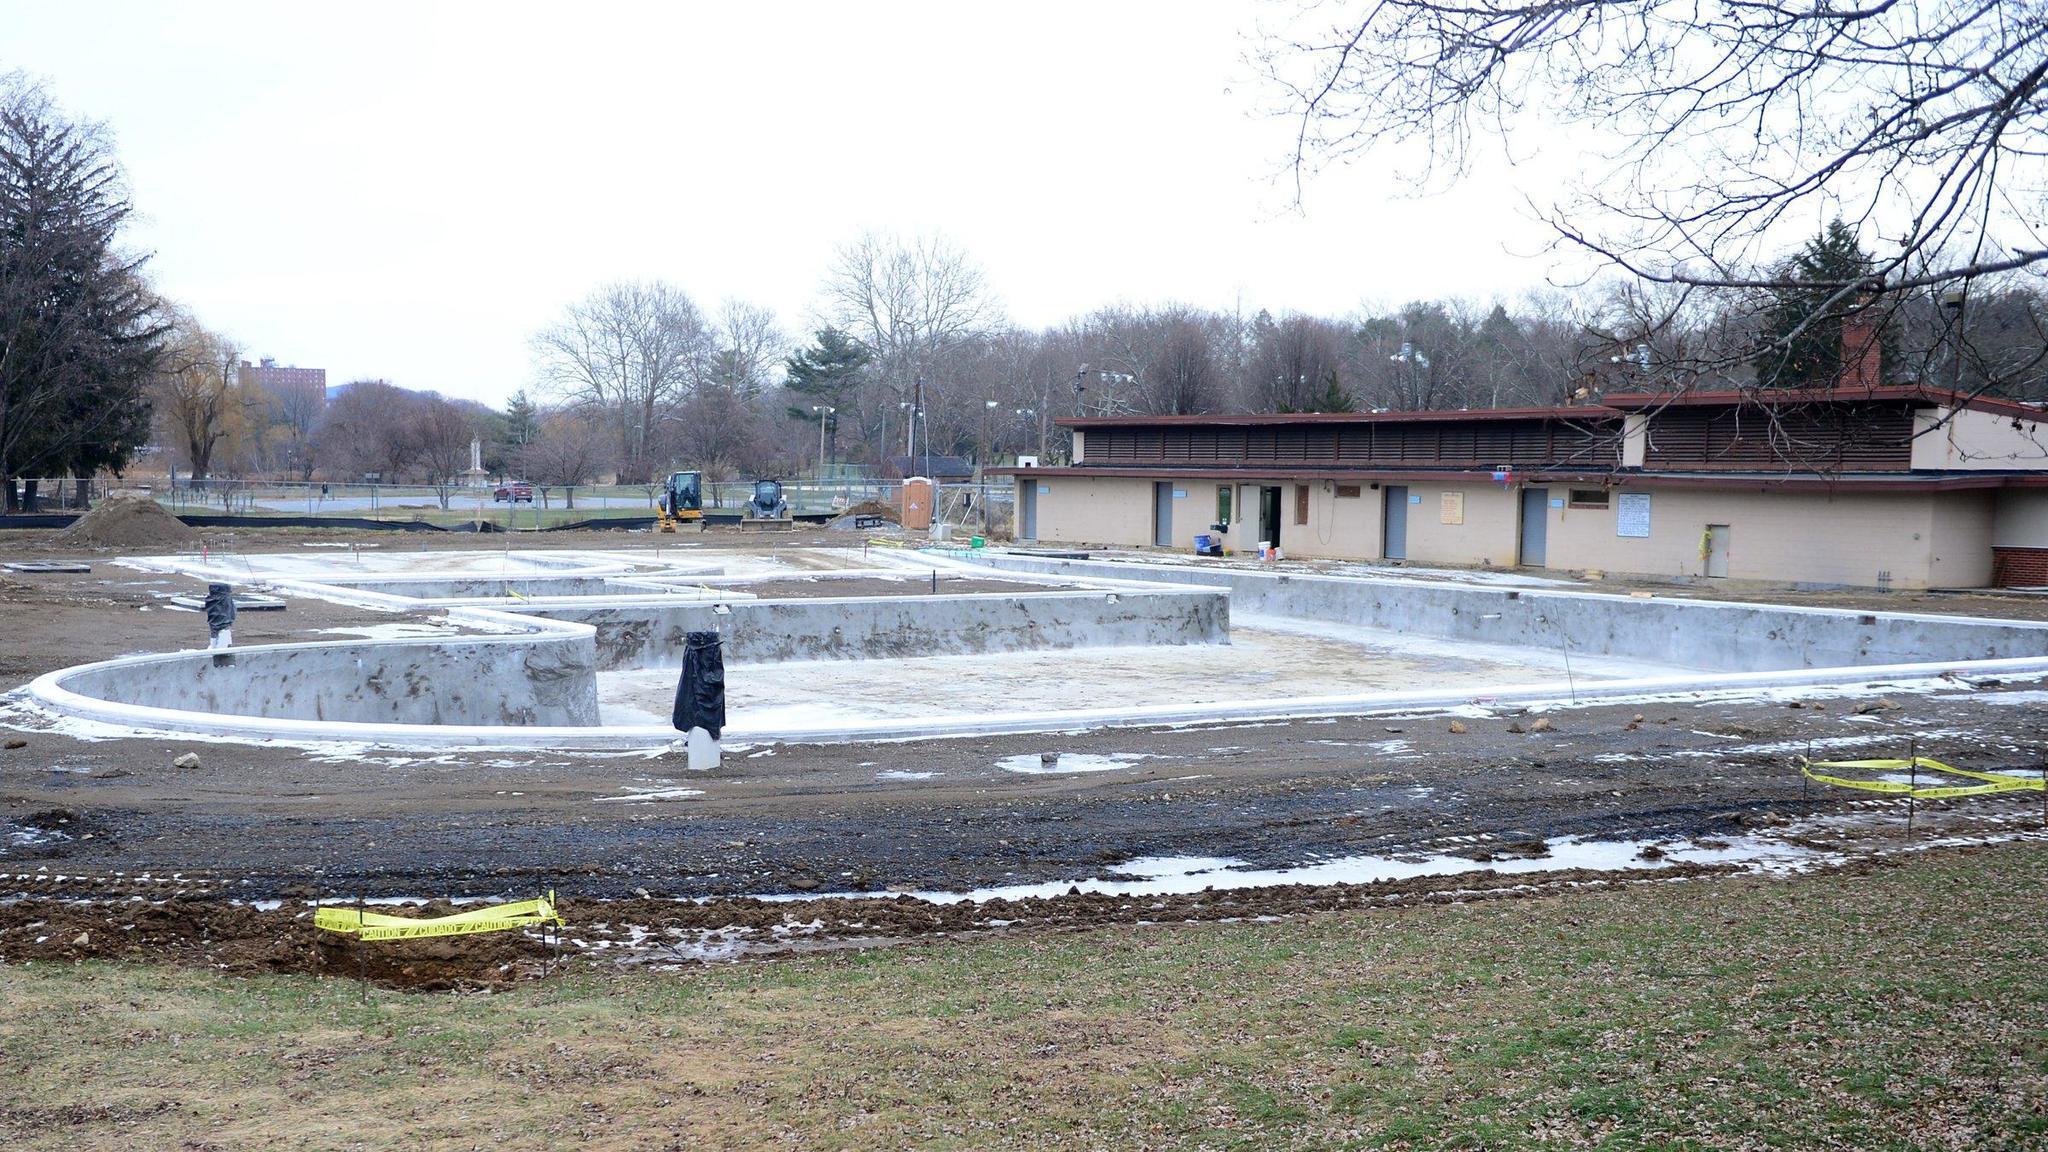 Cost of cedar beach pool renovation climbs again the - Cedar beach swimming pool allentown pa ...